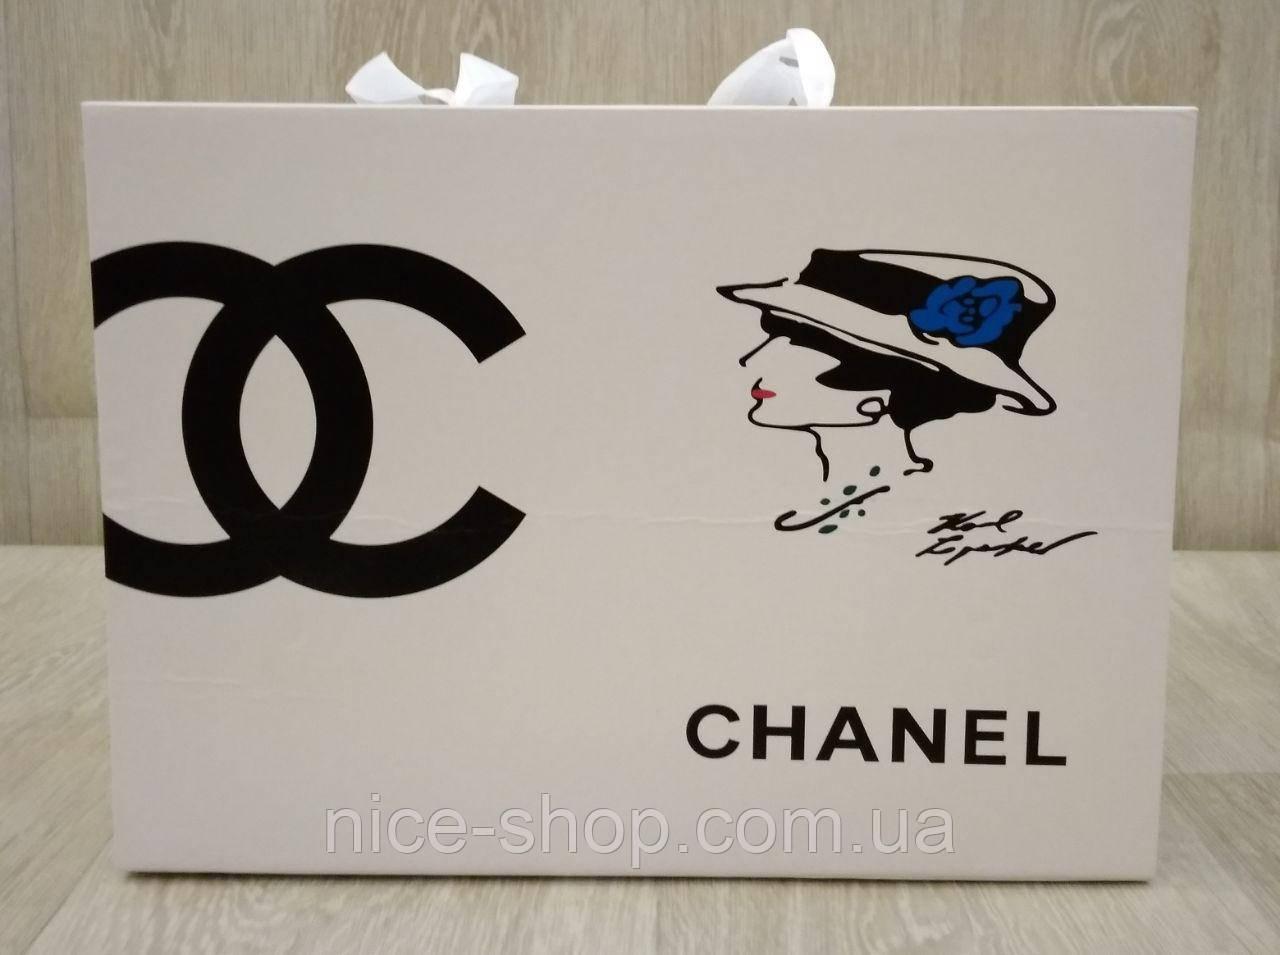 Подарочная брендовая коробка mini на магнитах